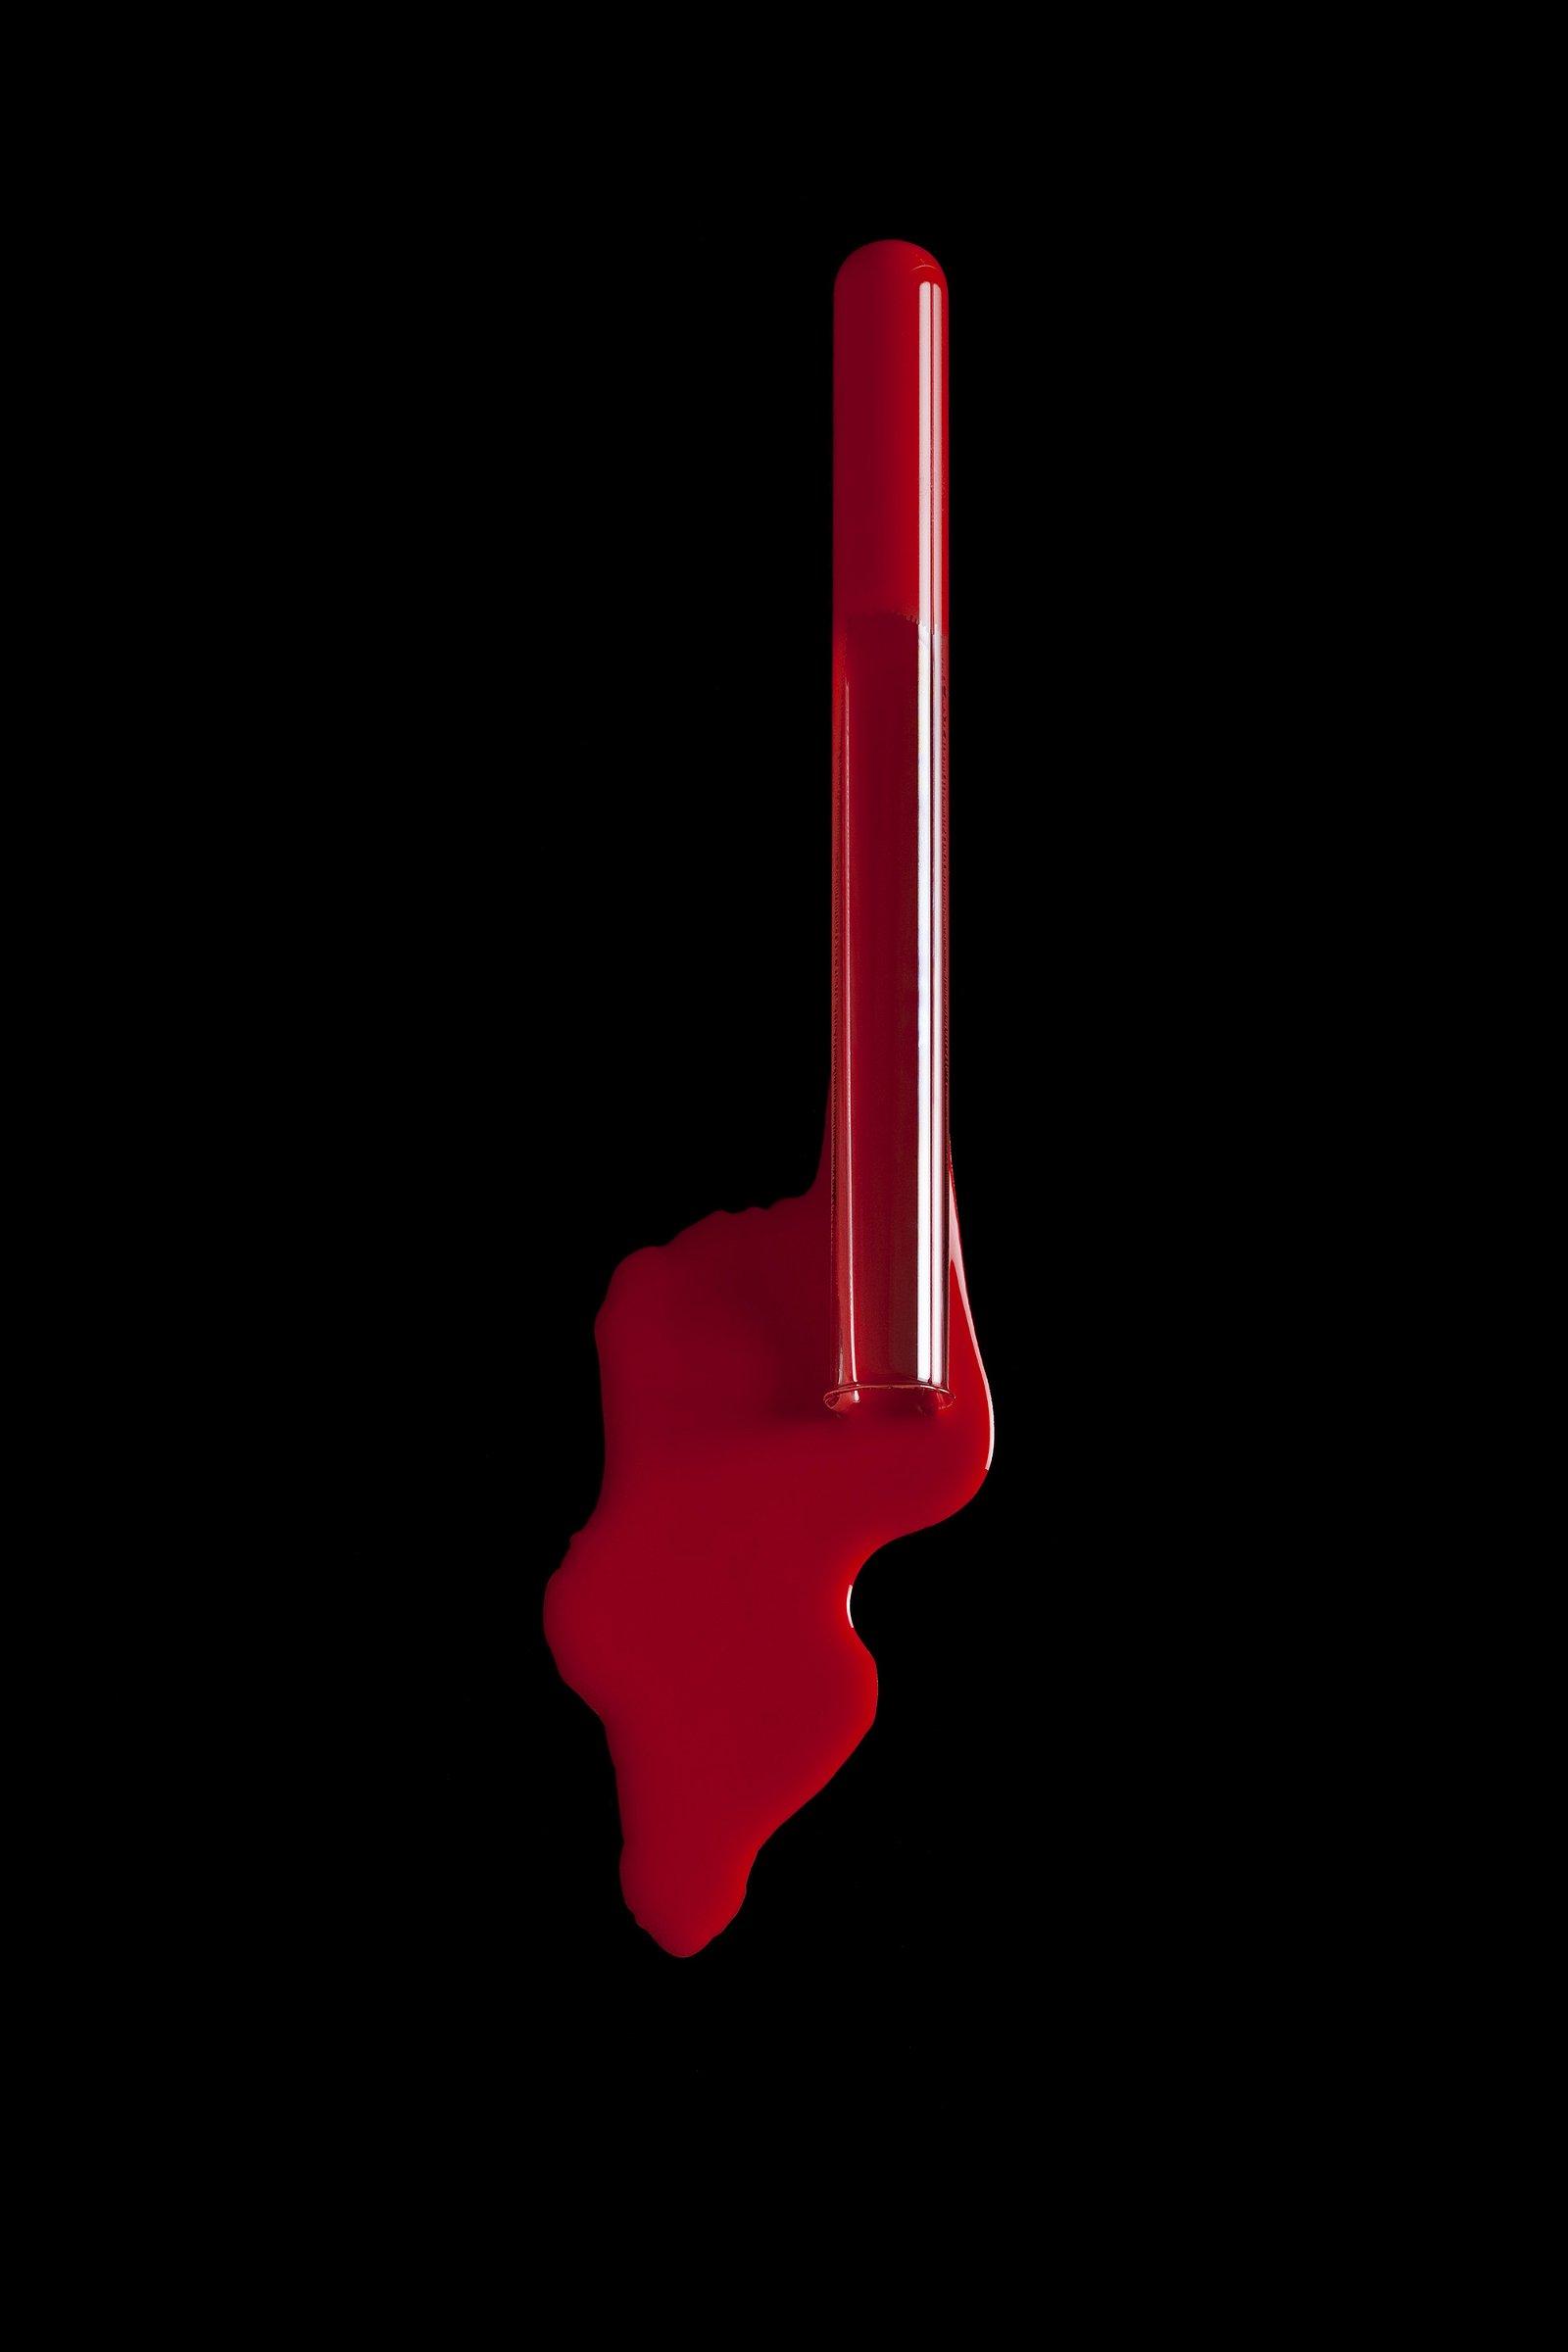 Cherrydeck - Still Life and Minimalism